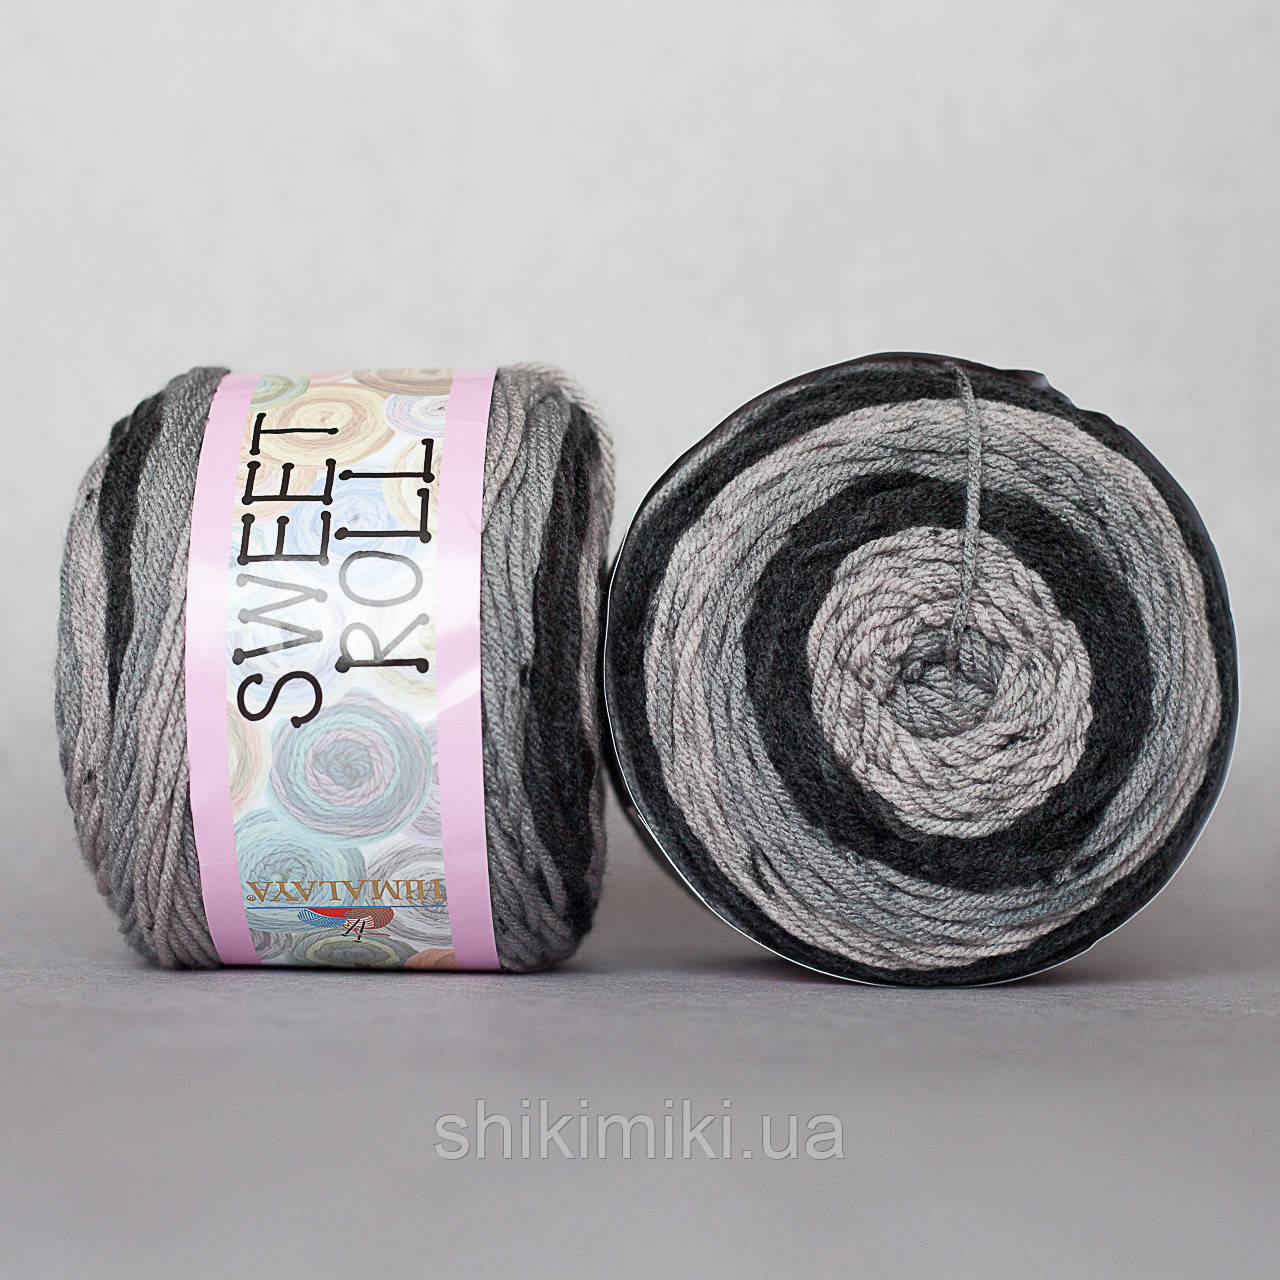 Пряжа  секционная Sweet Roll, цвет Черно-серый